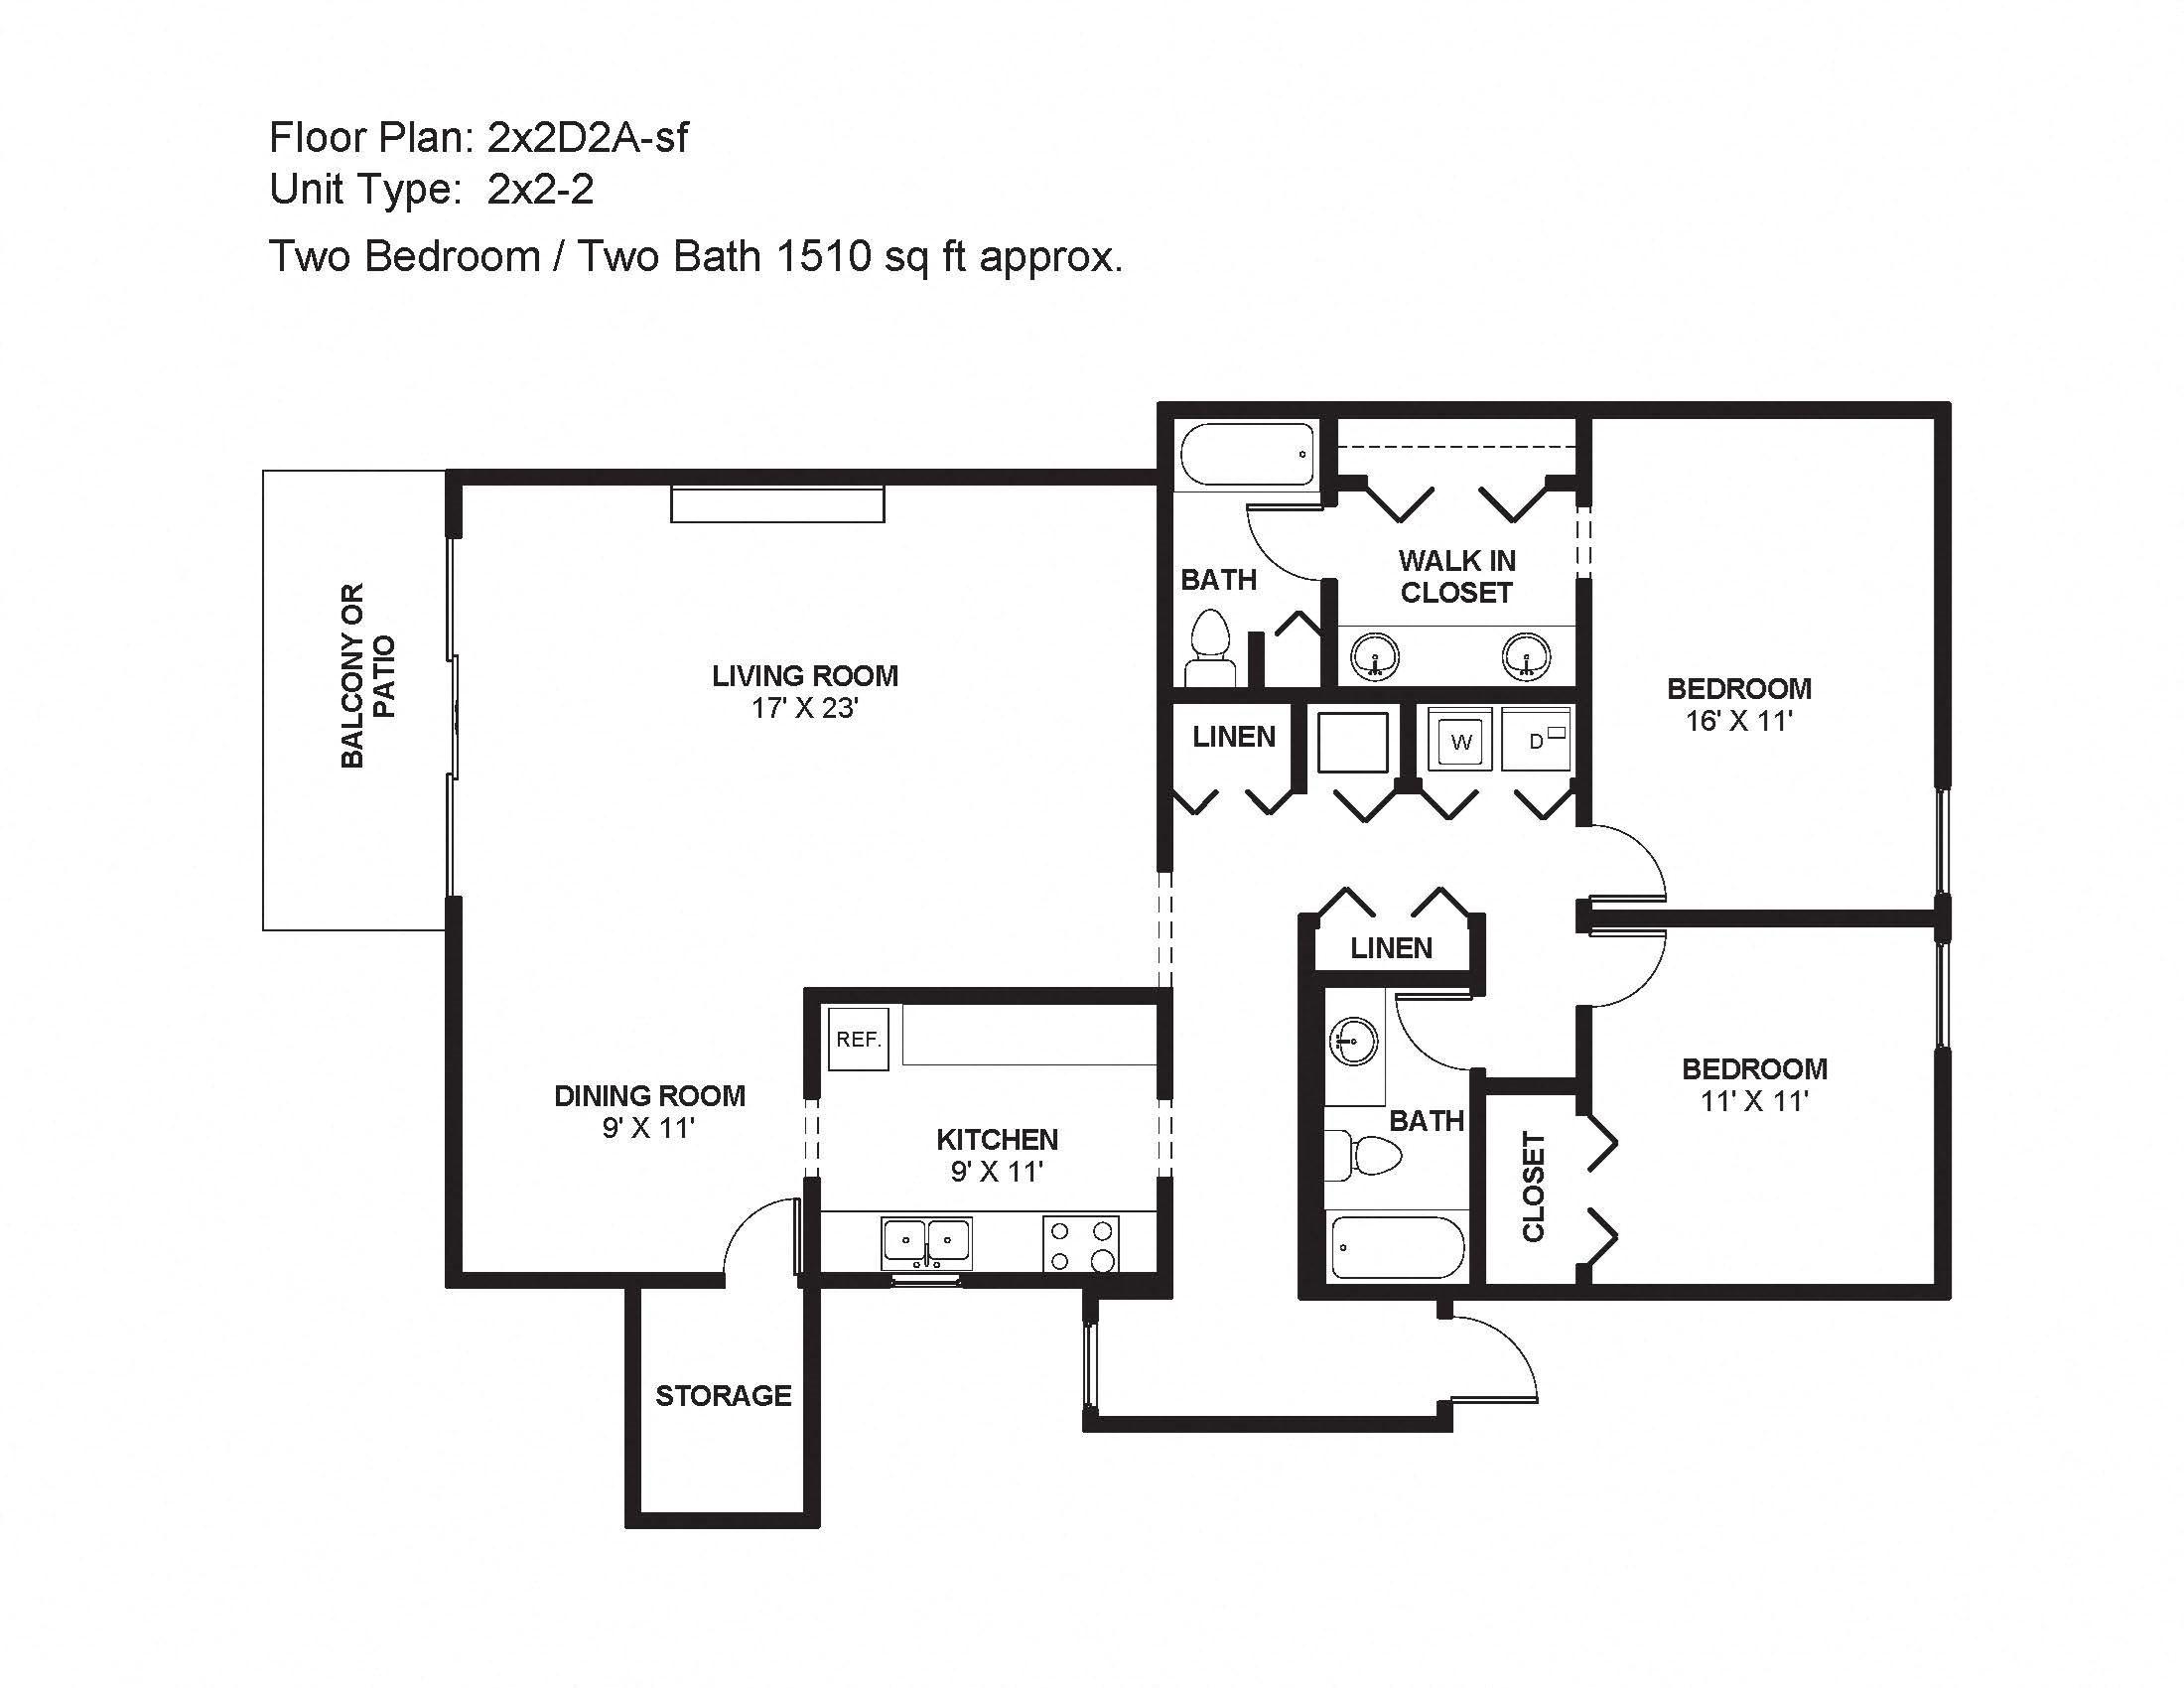 2x2D2A-sf Floor Plan 14